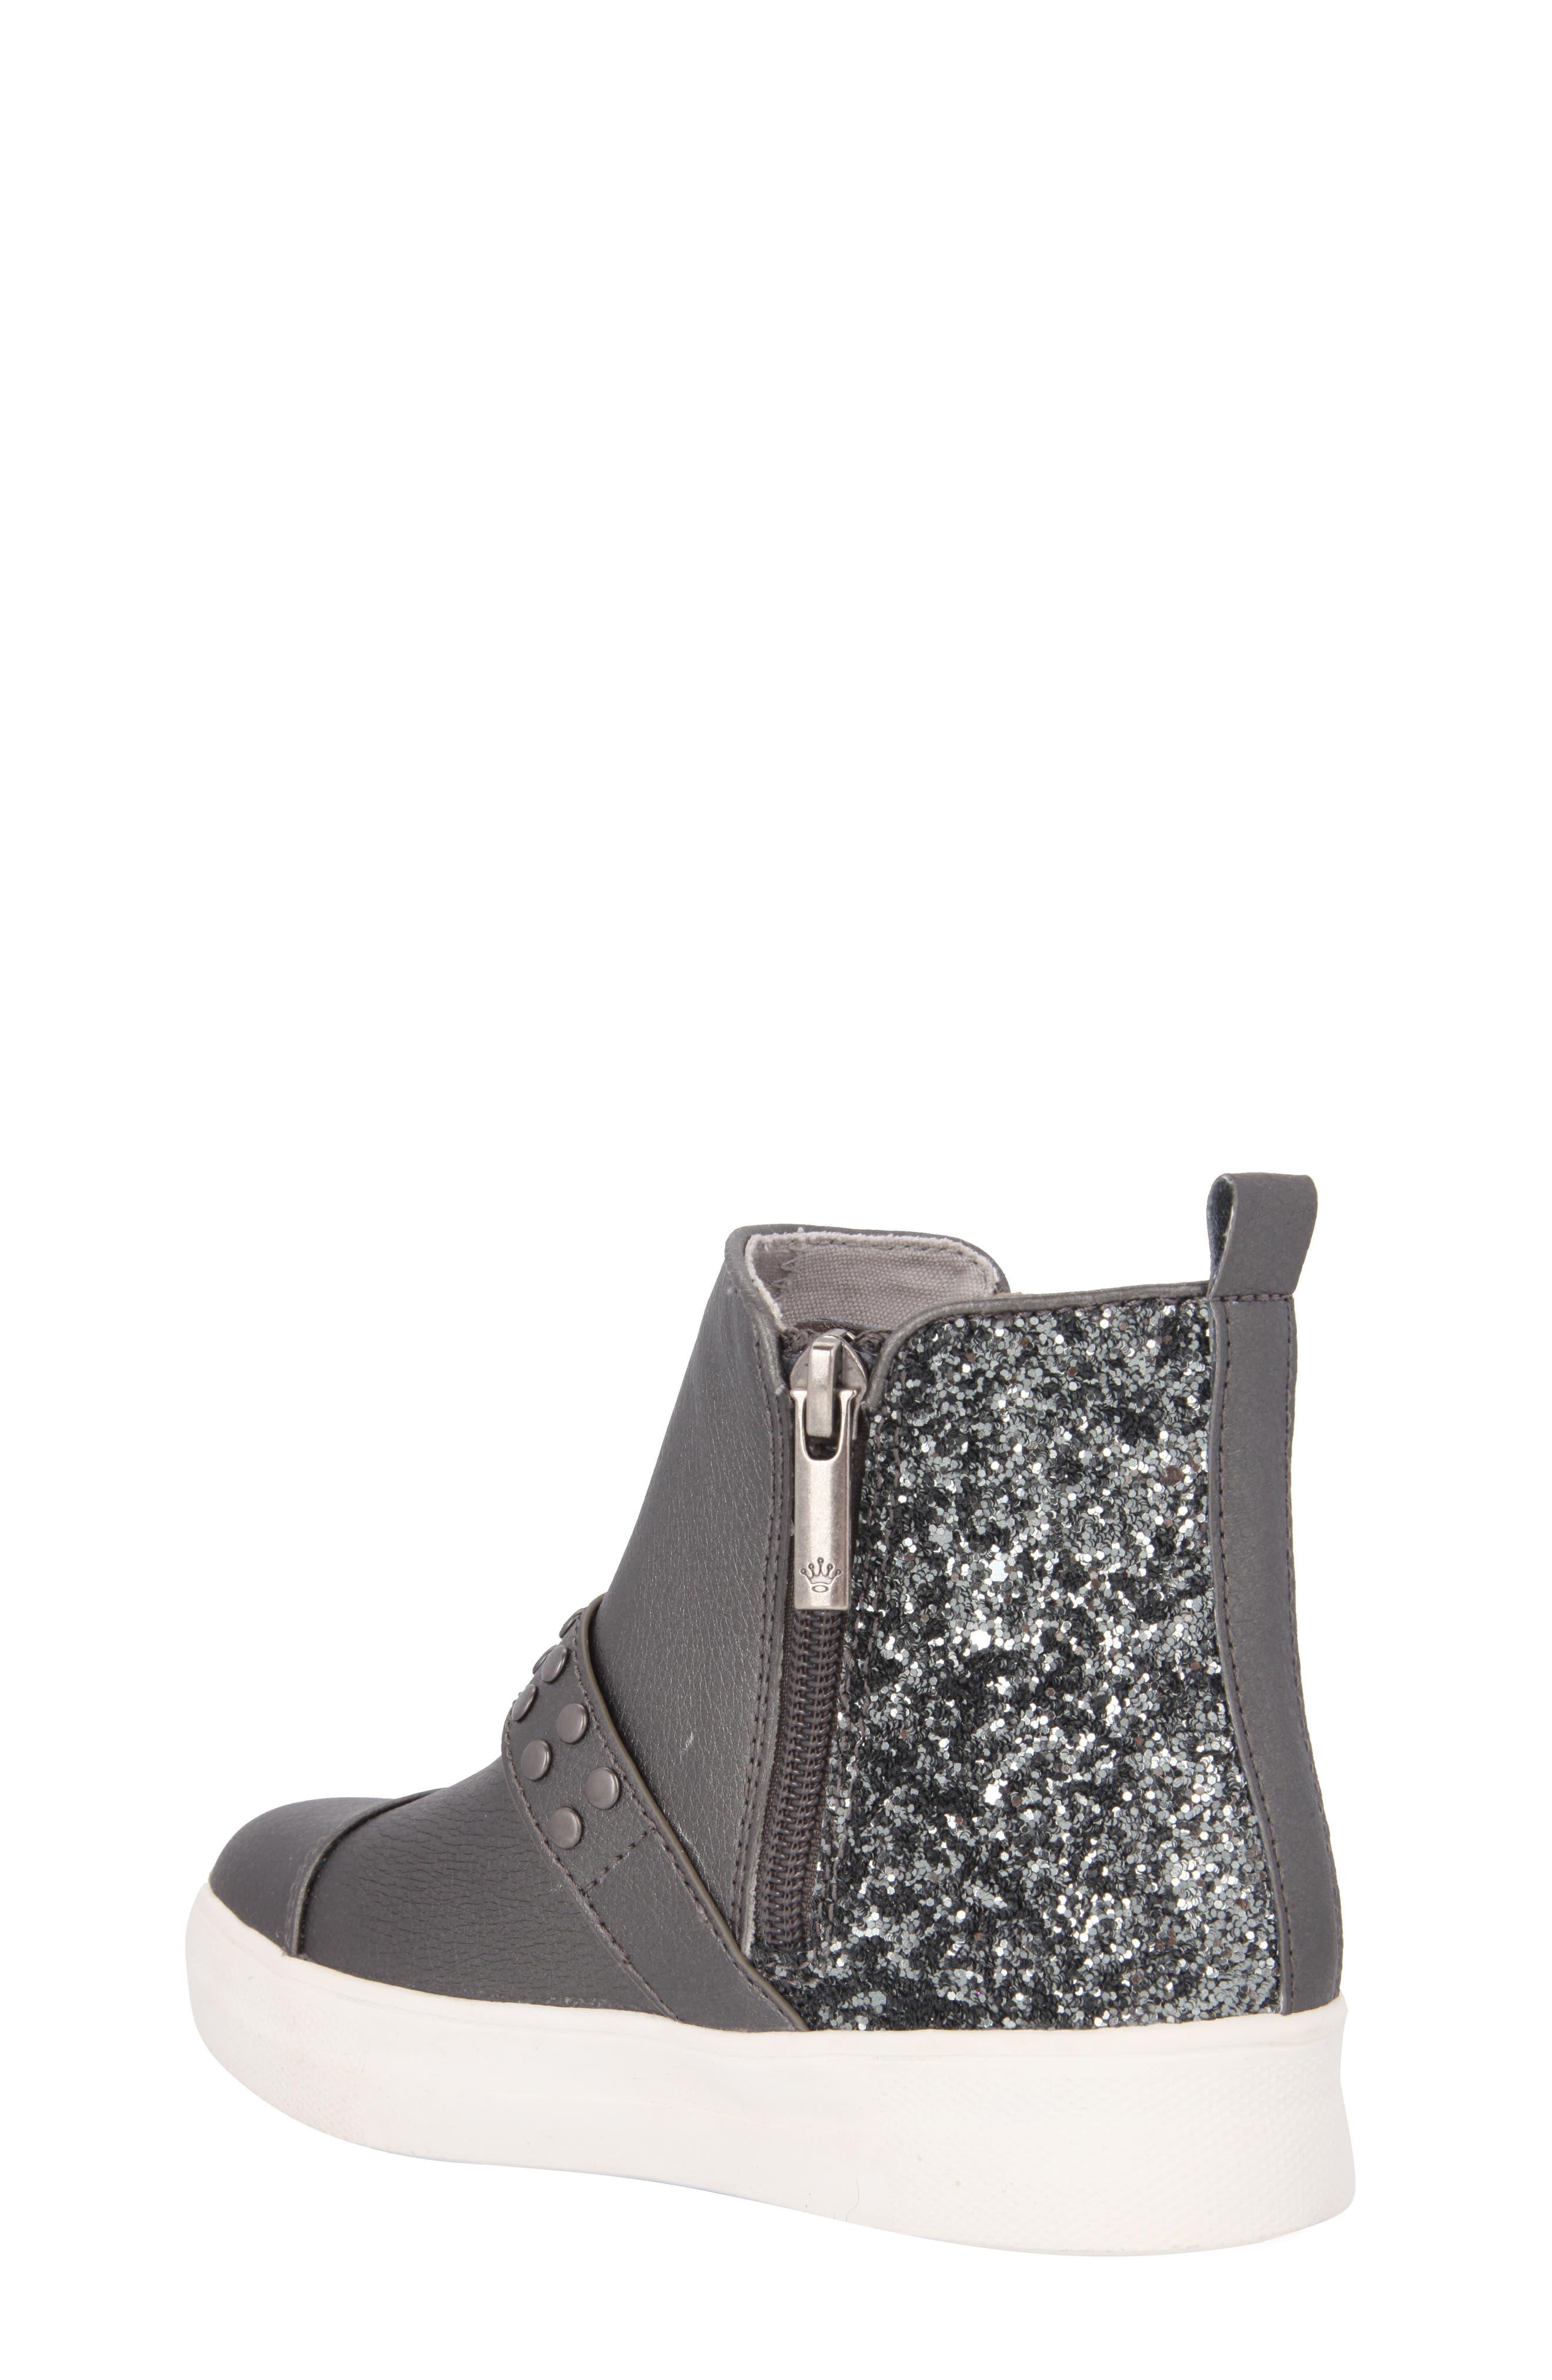 Pammela Glittery High Top Sneaker,                             Alternate thumbnail 2, color,                             Metallic Pewter